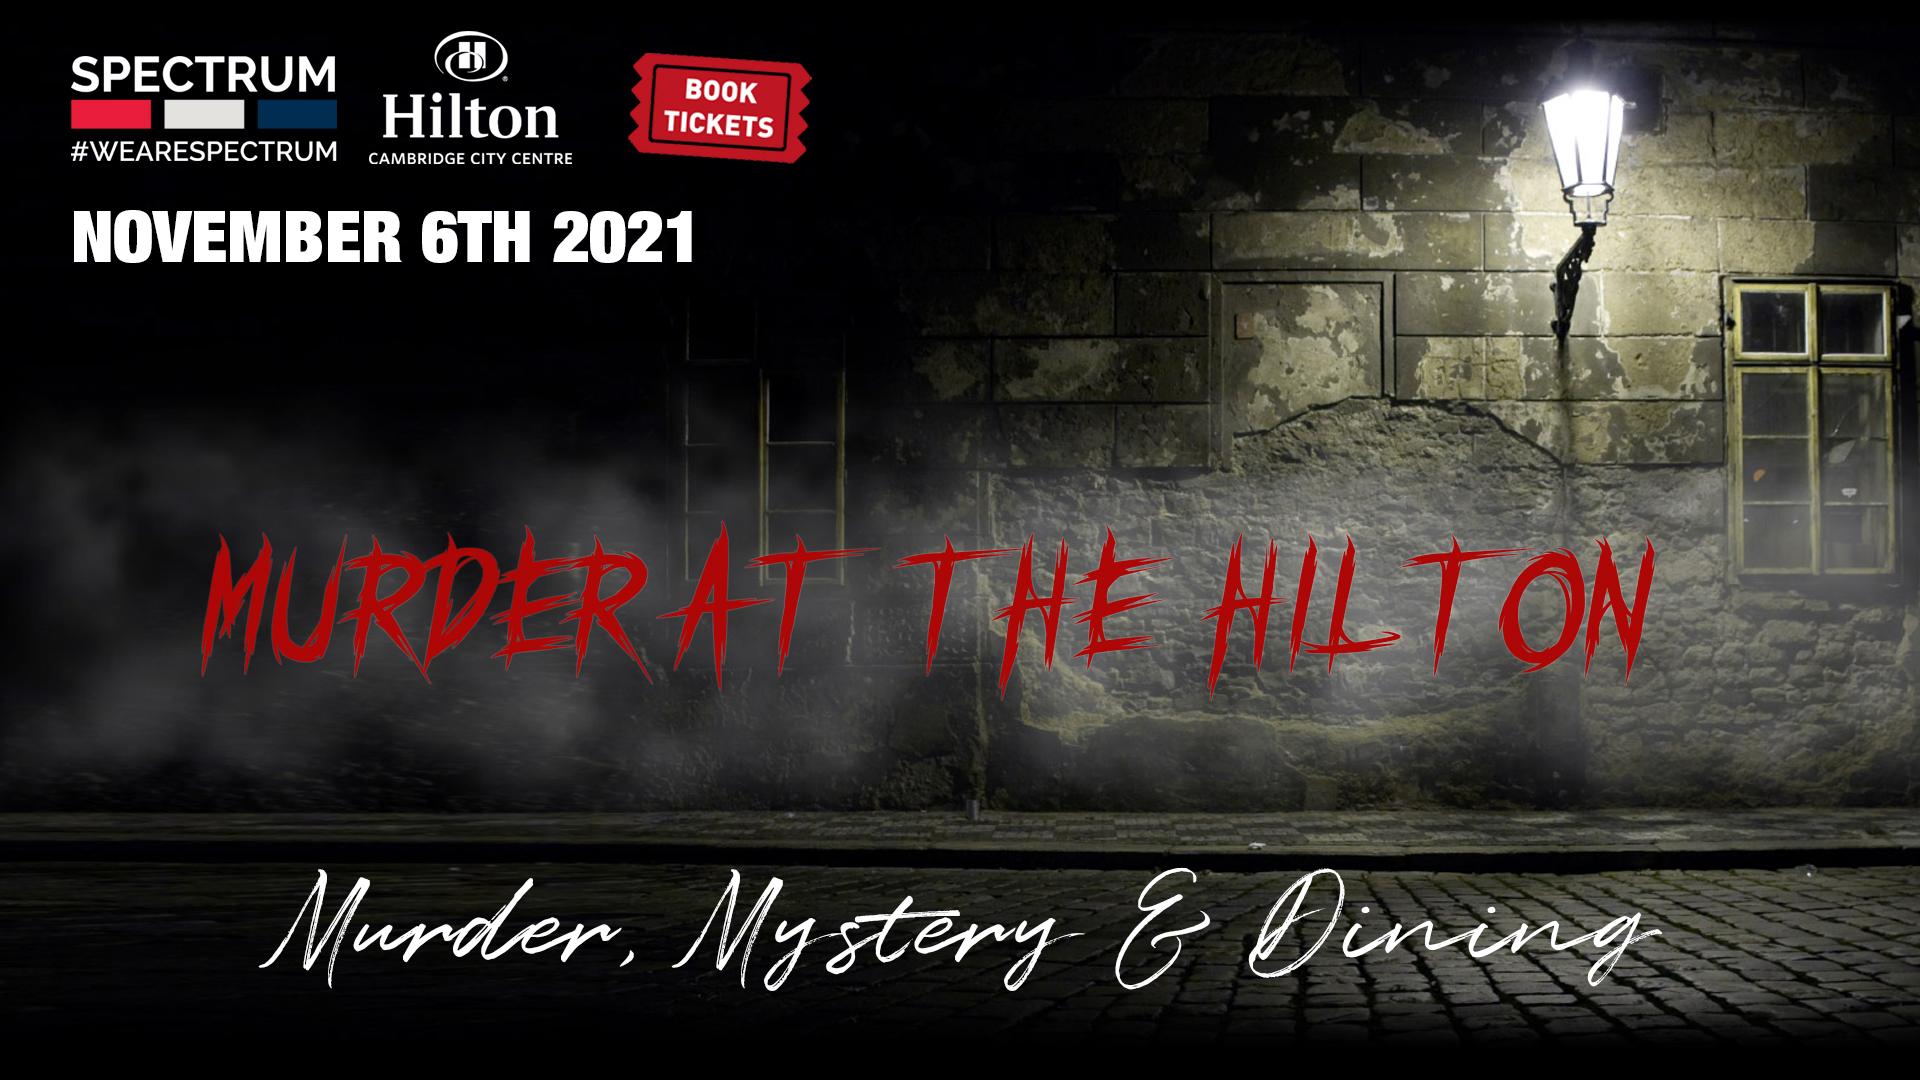 Murder at the Hilton 2021